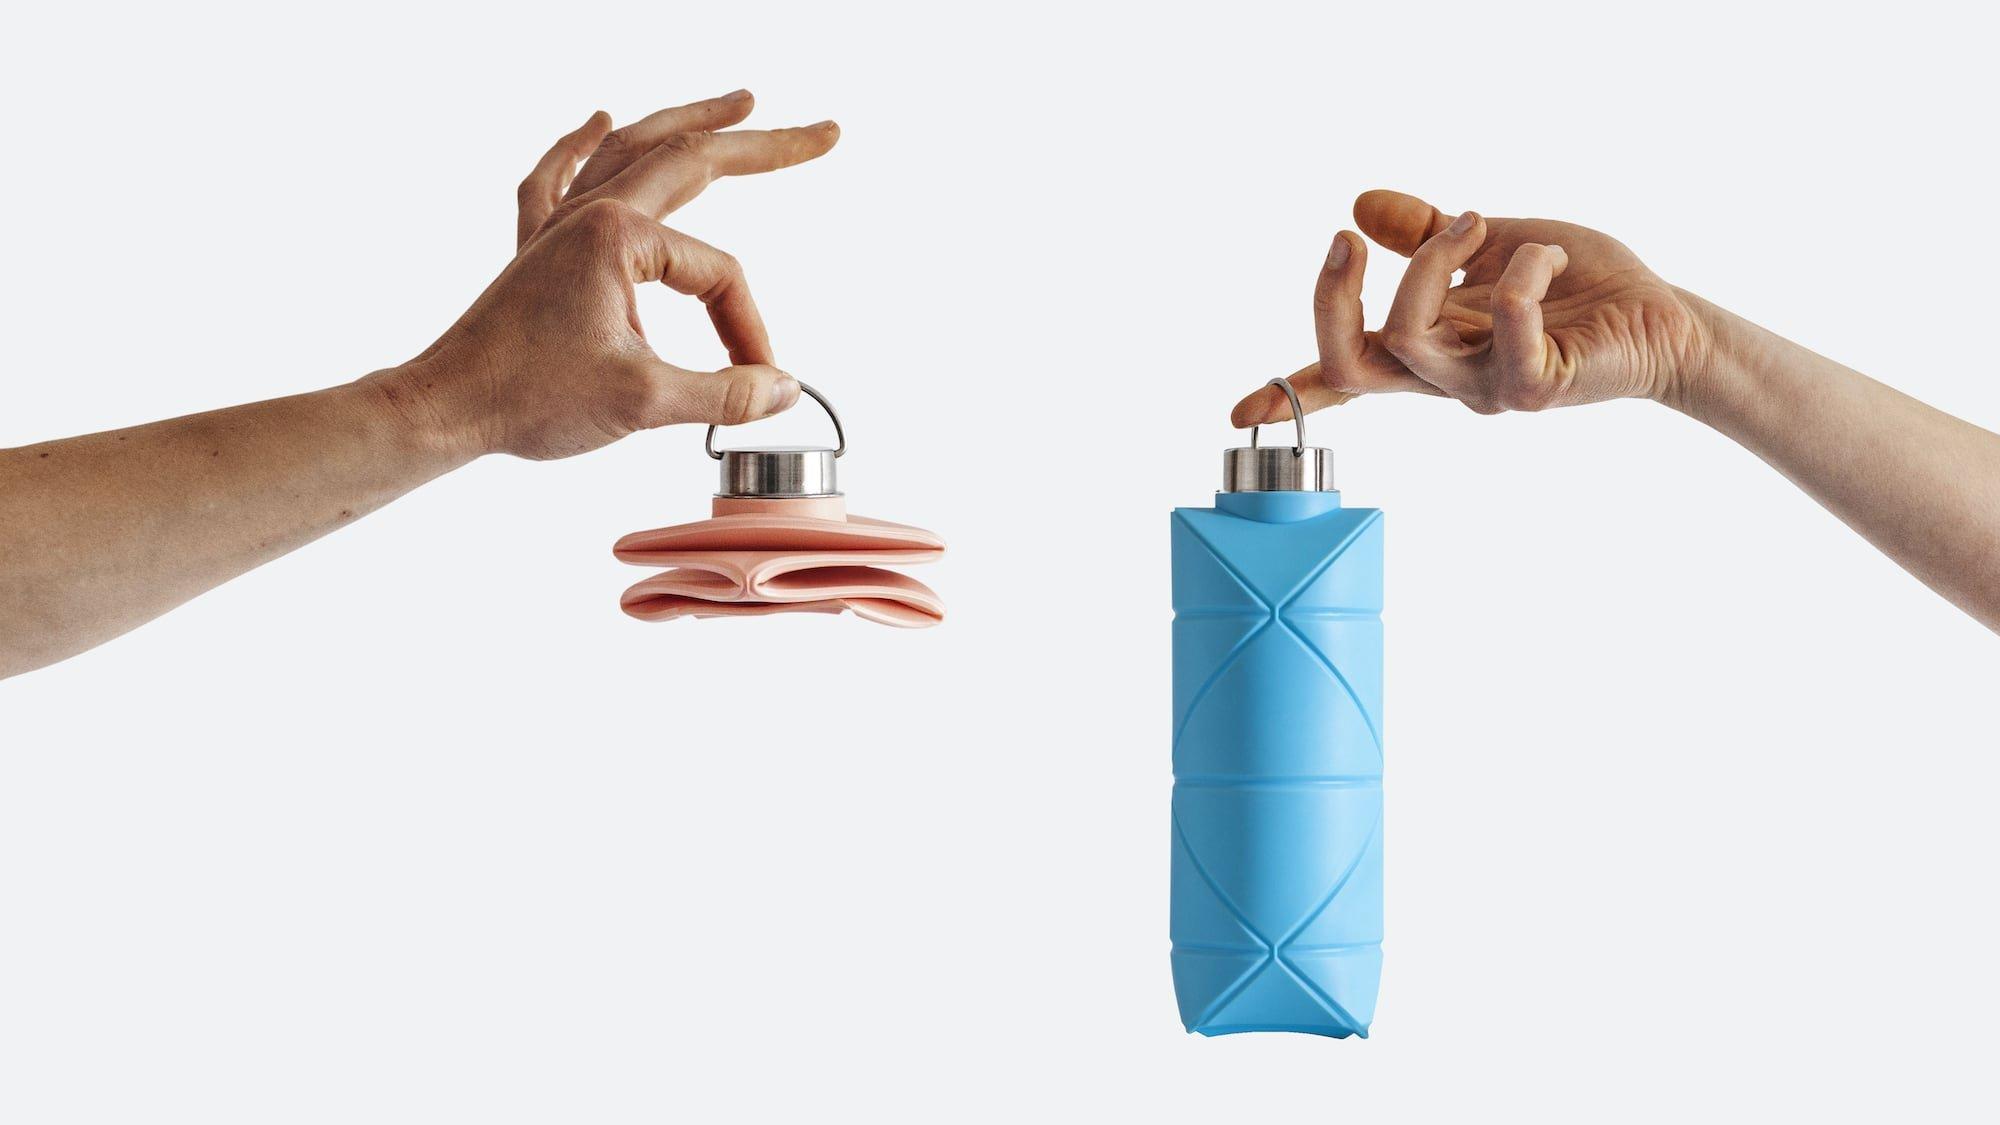 Origami Bottle Novel Reusable Bottle folds flat to fit in your pocket